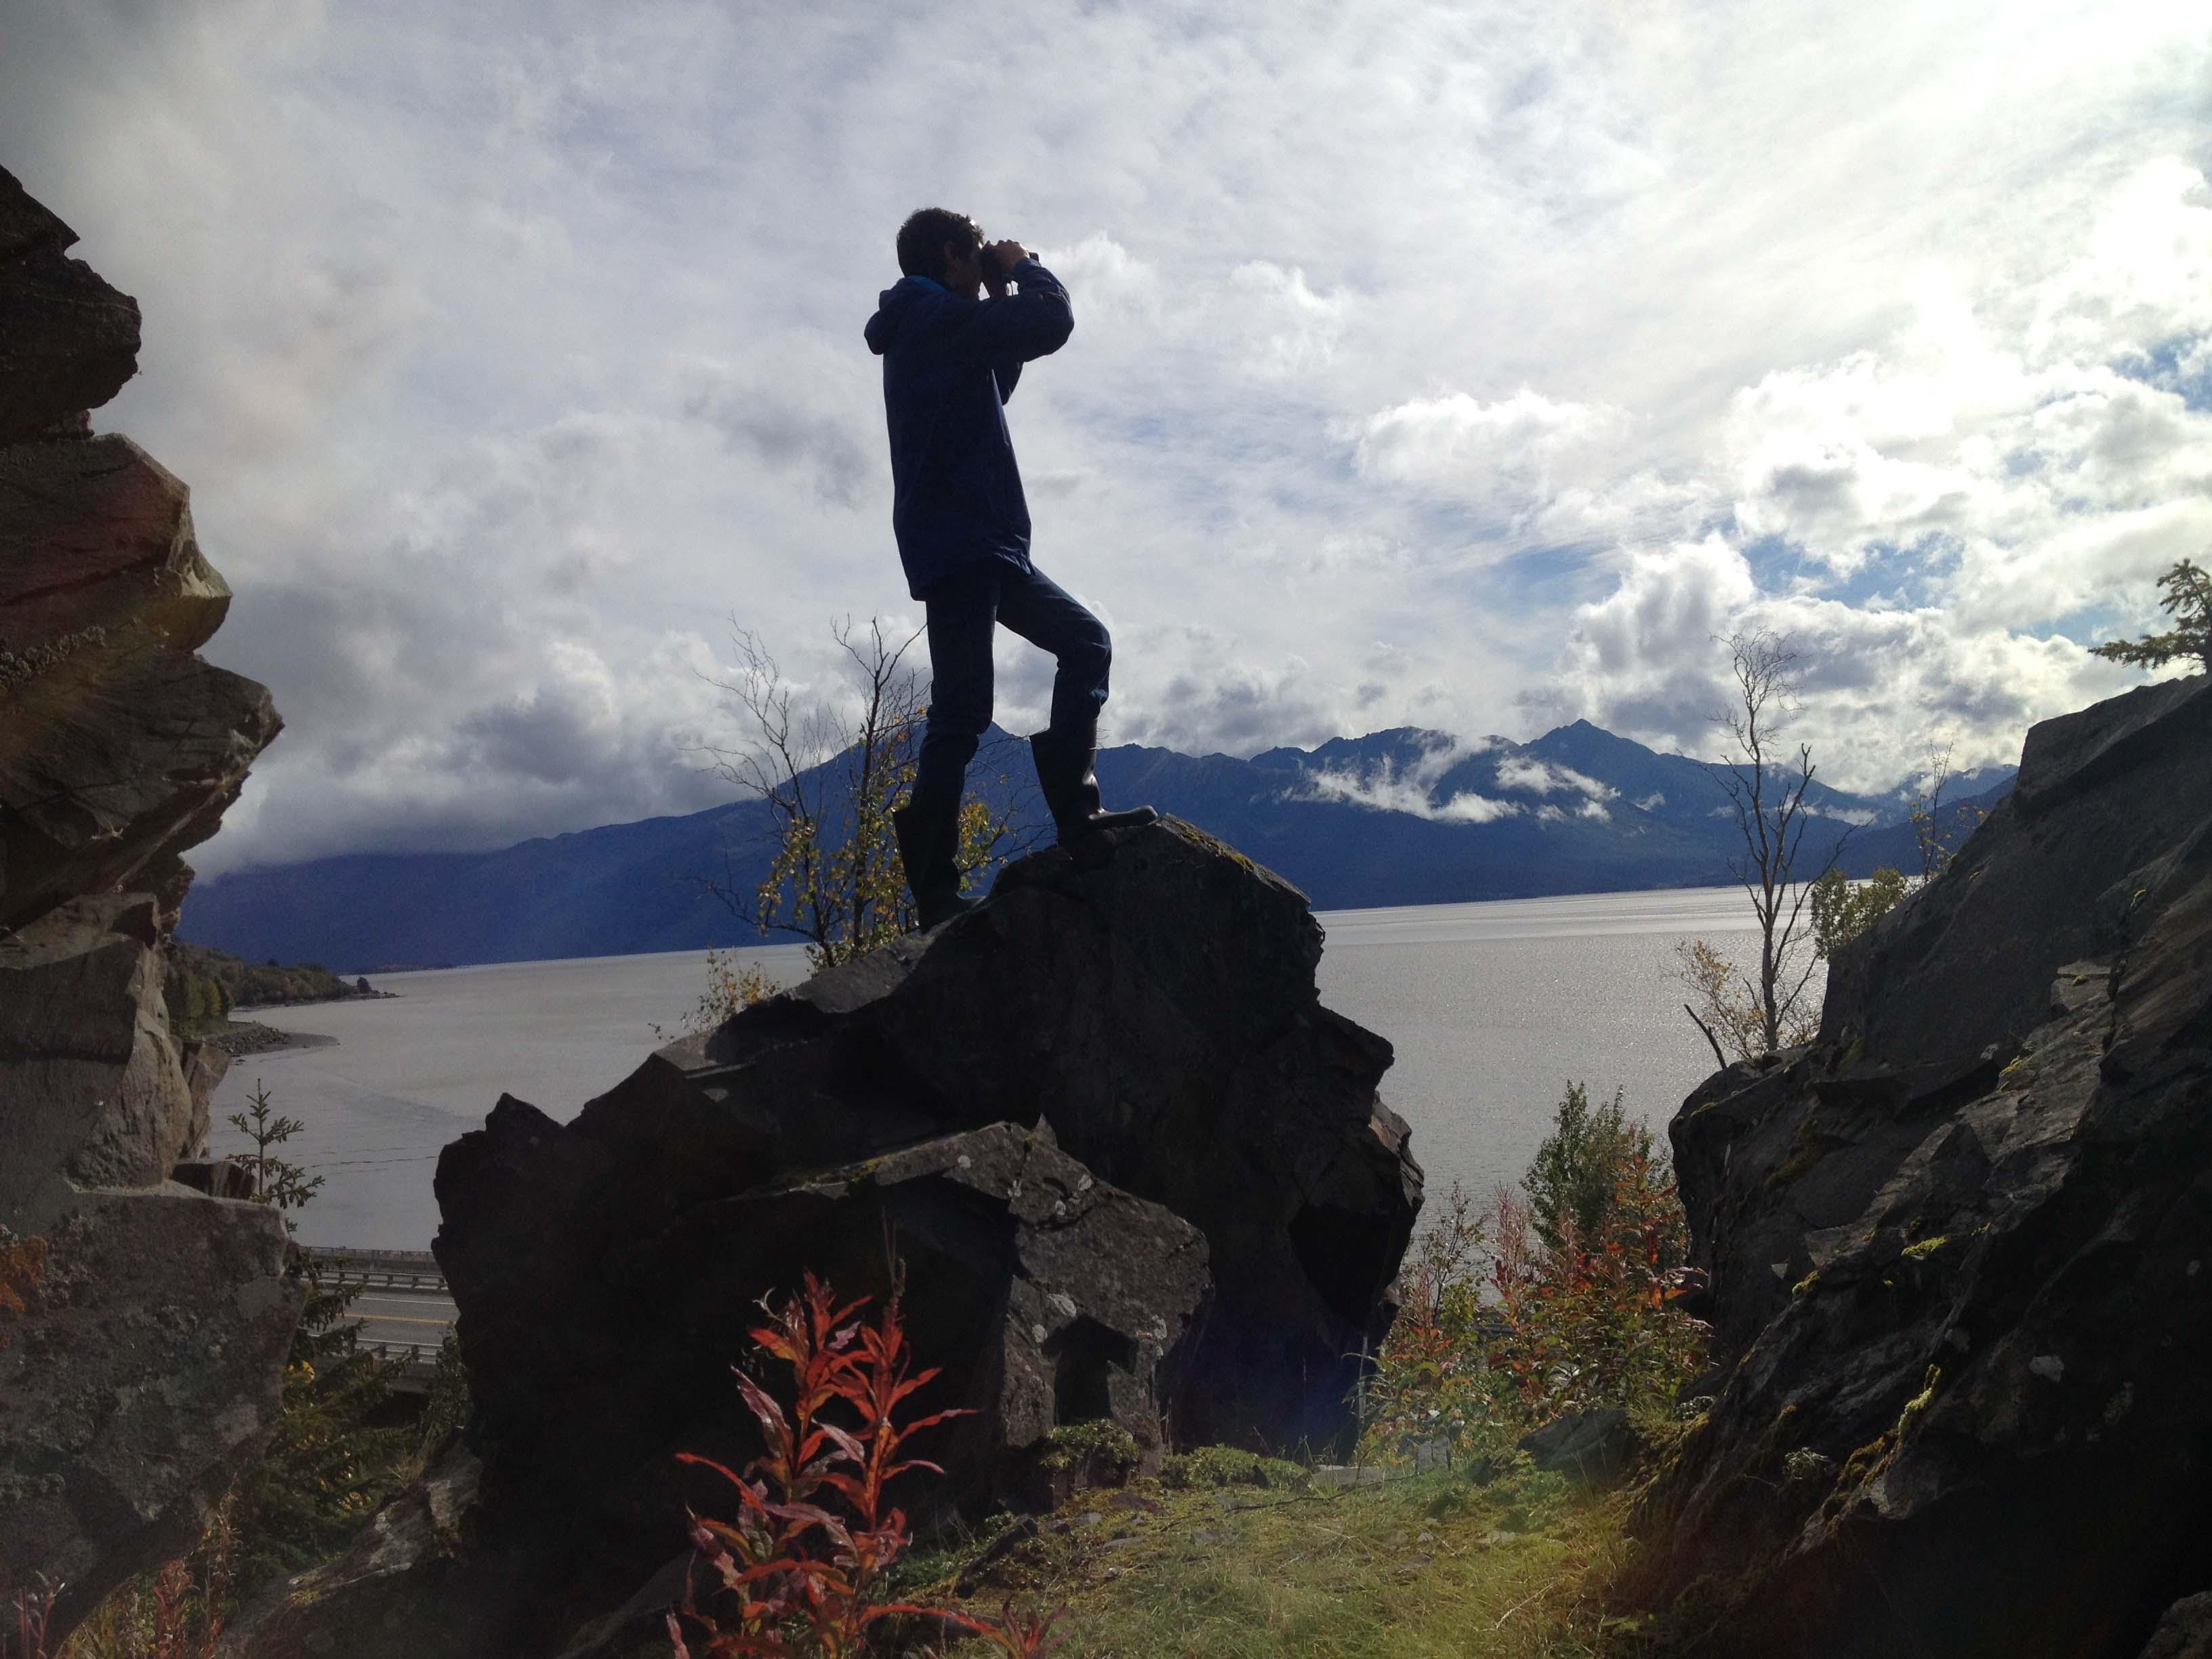 Student with binoculars gazes over cook inlet